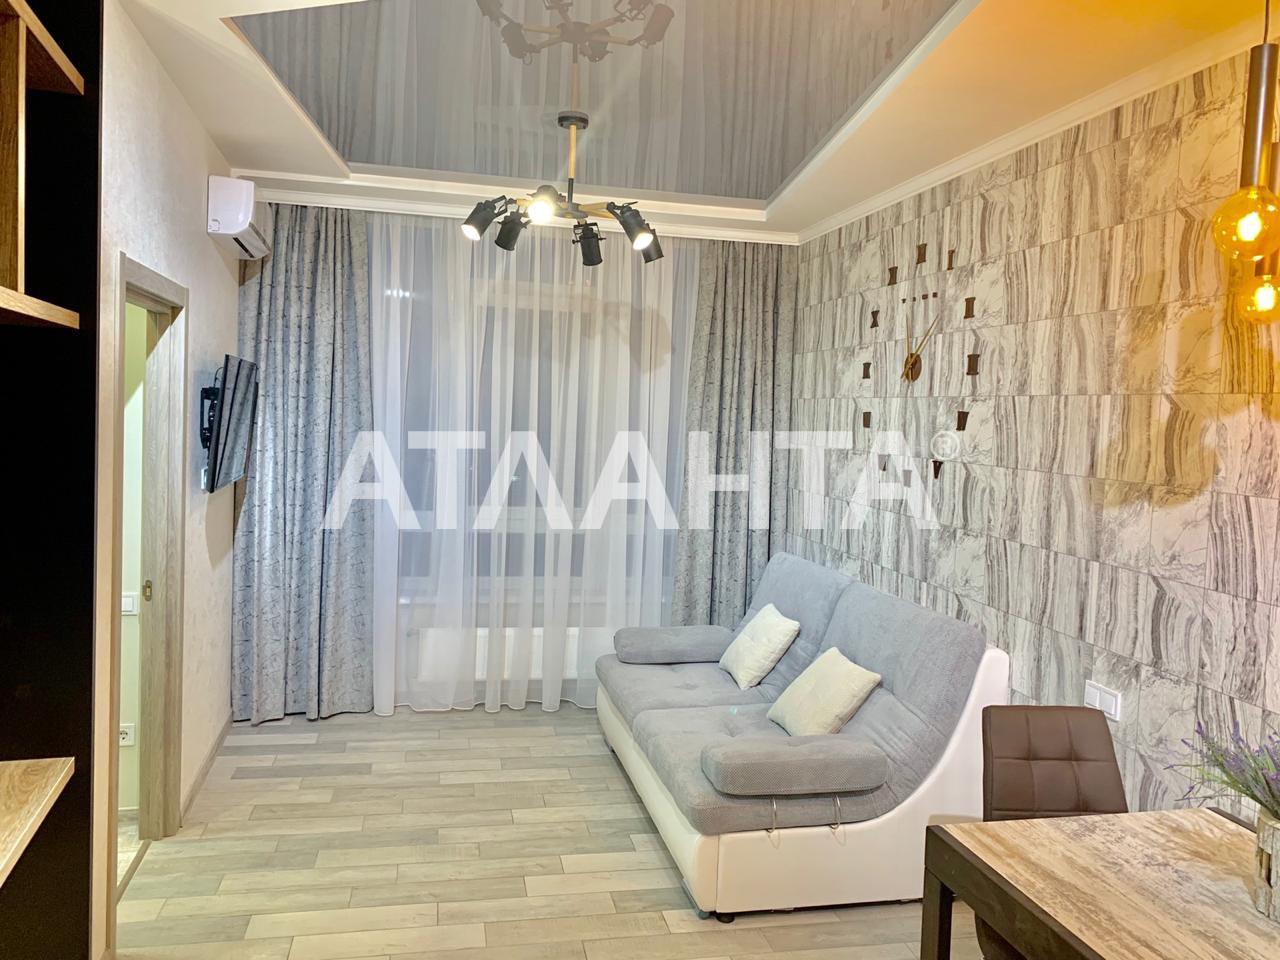 Продается 1-комнатная Квартира на ул. Генуэзская — 68 000 у.е. (фото №2)